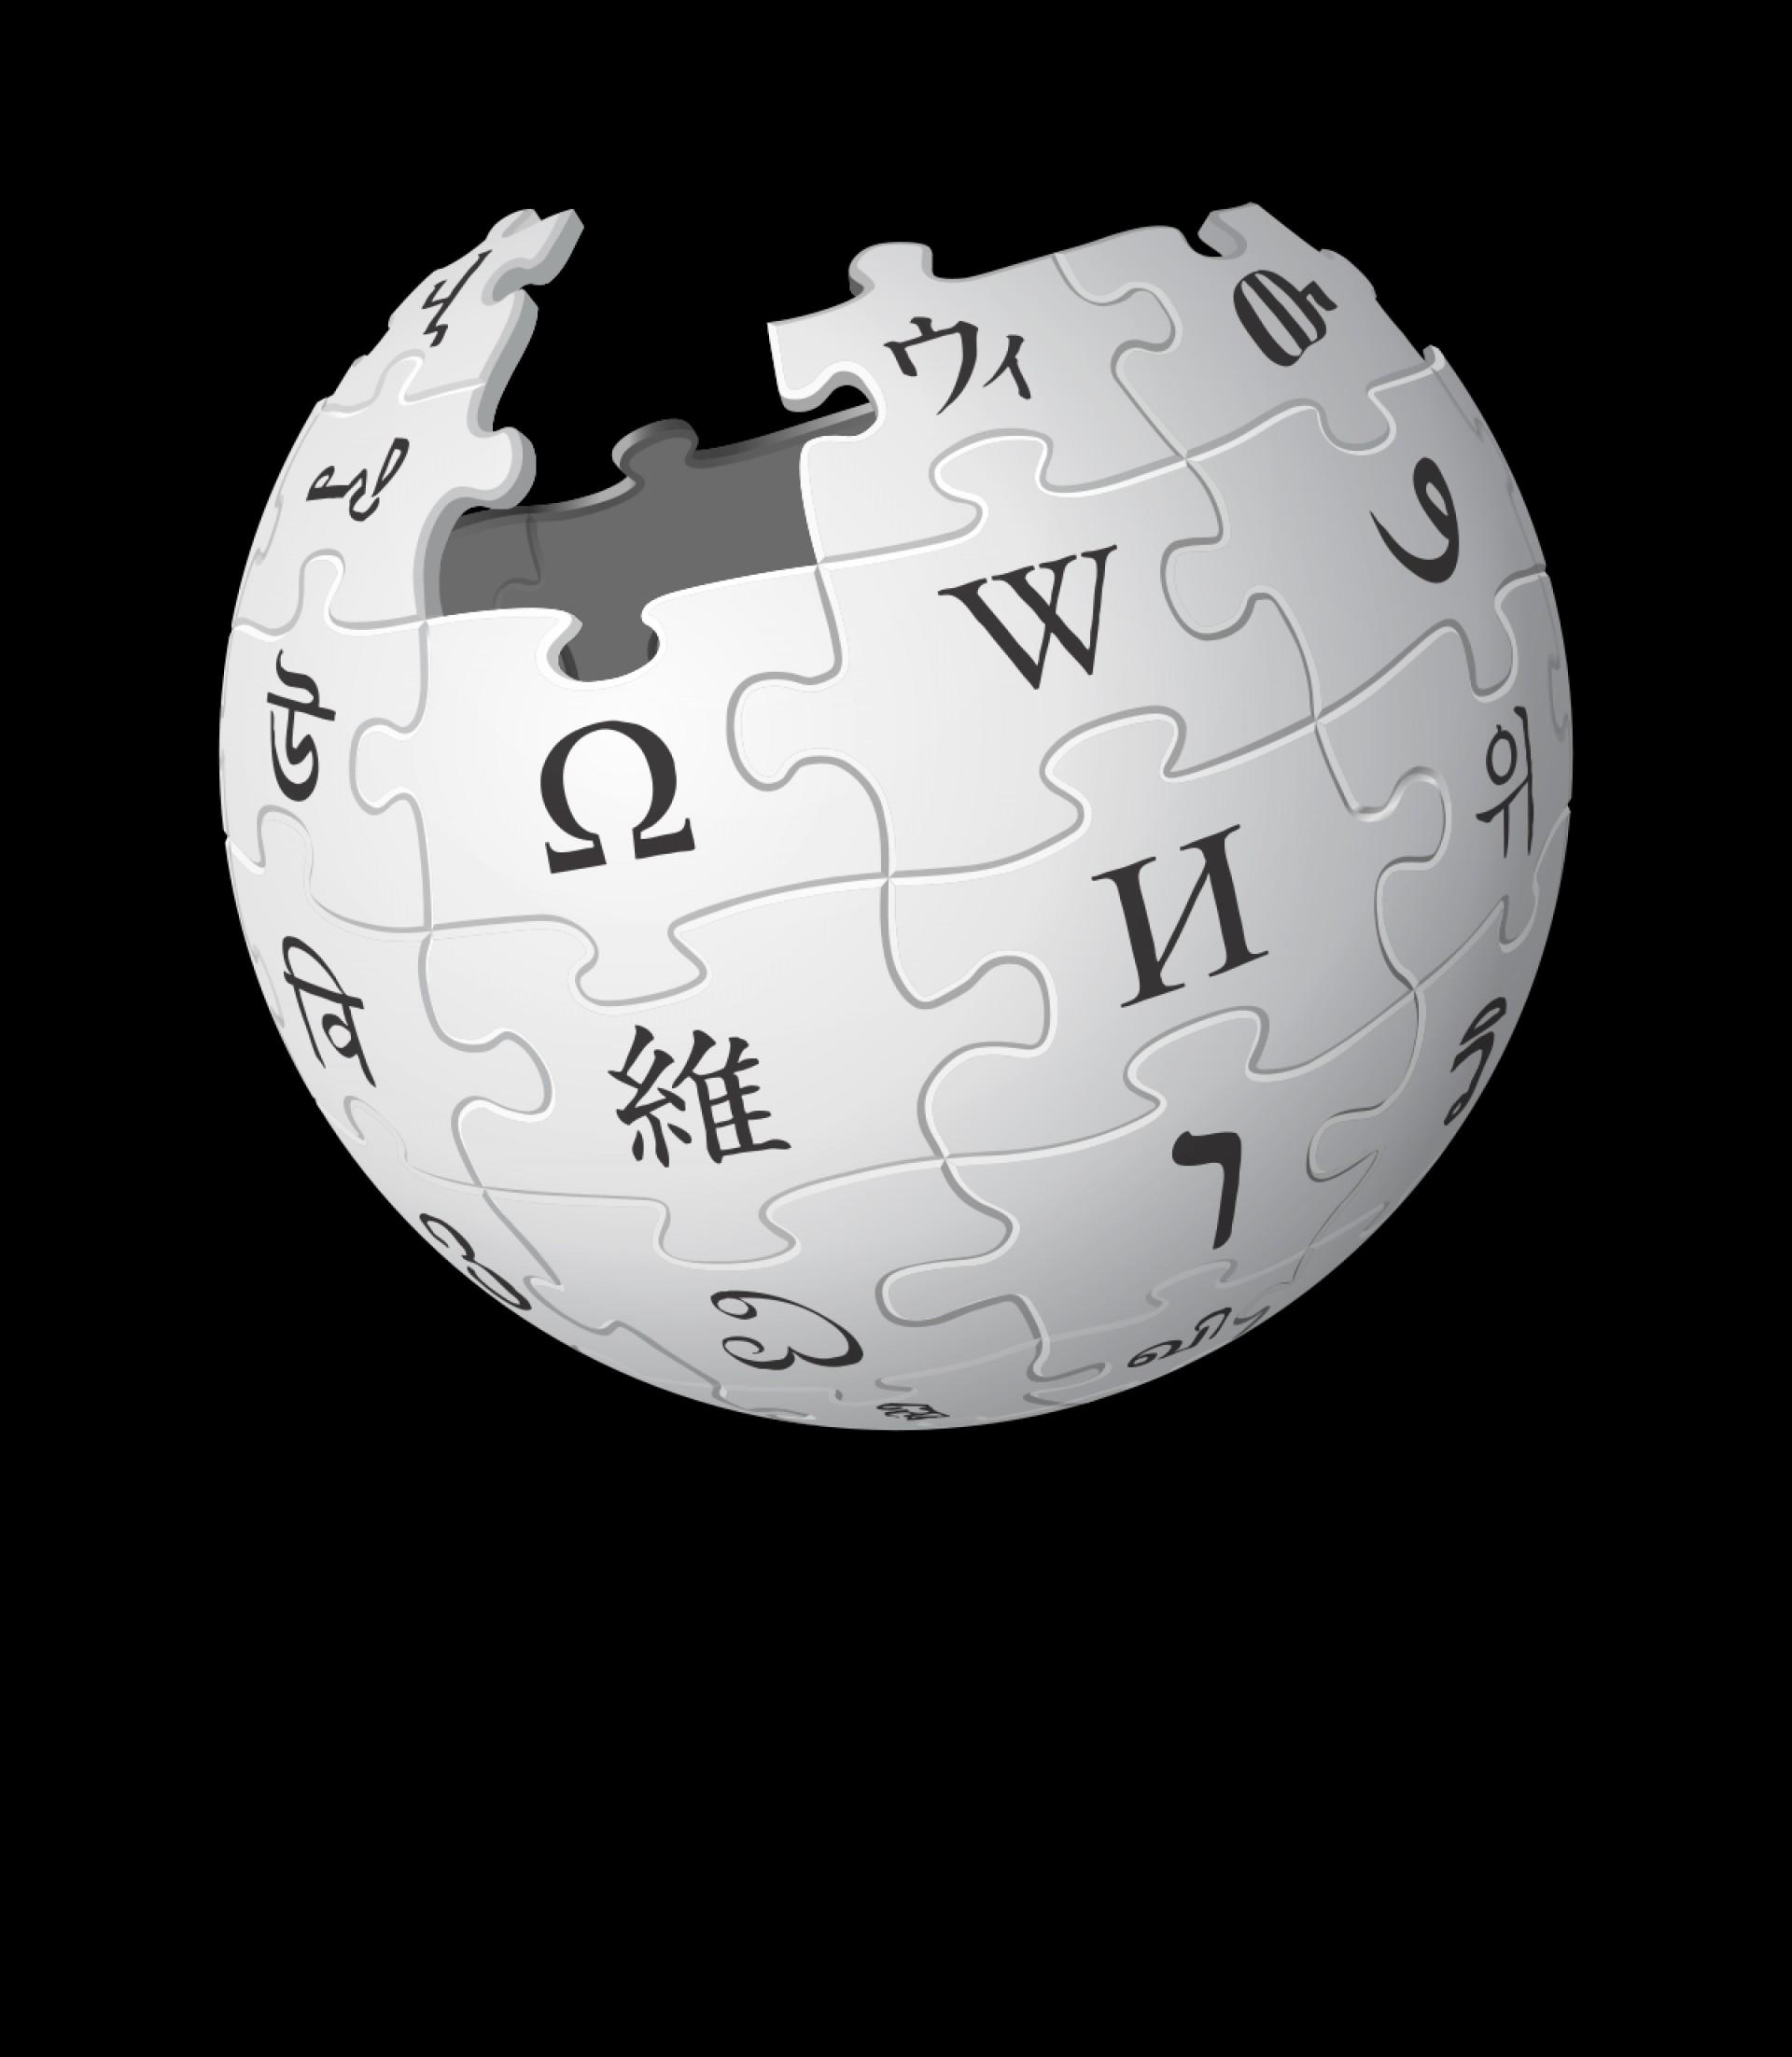 019 1200px Wikipedia Logo V2 Bn Svg Save Water Essay Awful Life In Tamil Gujarati 1920